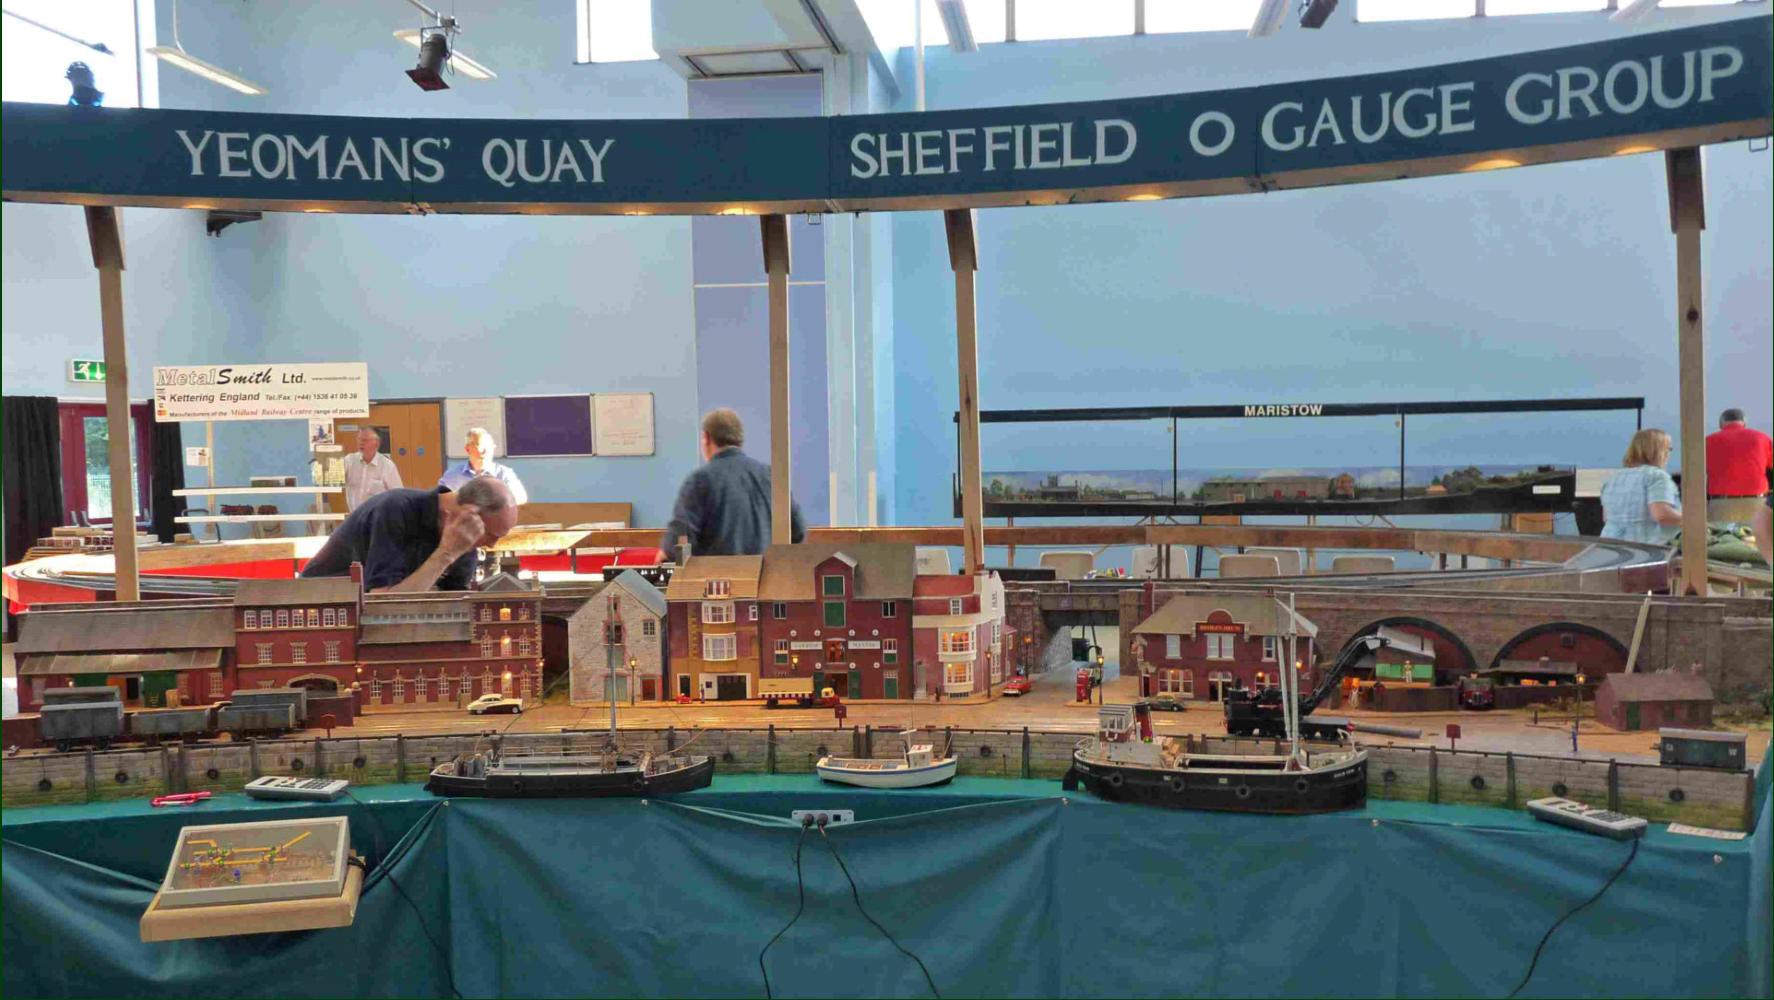 Sheffield O Gauge Group